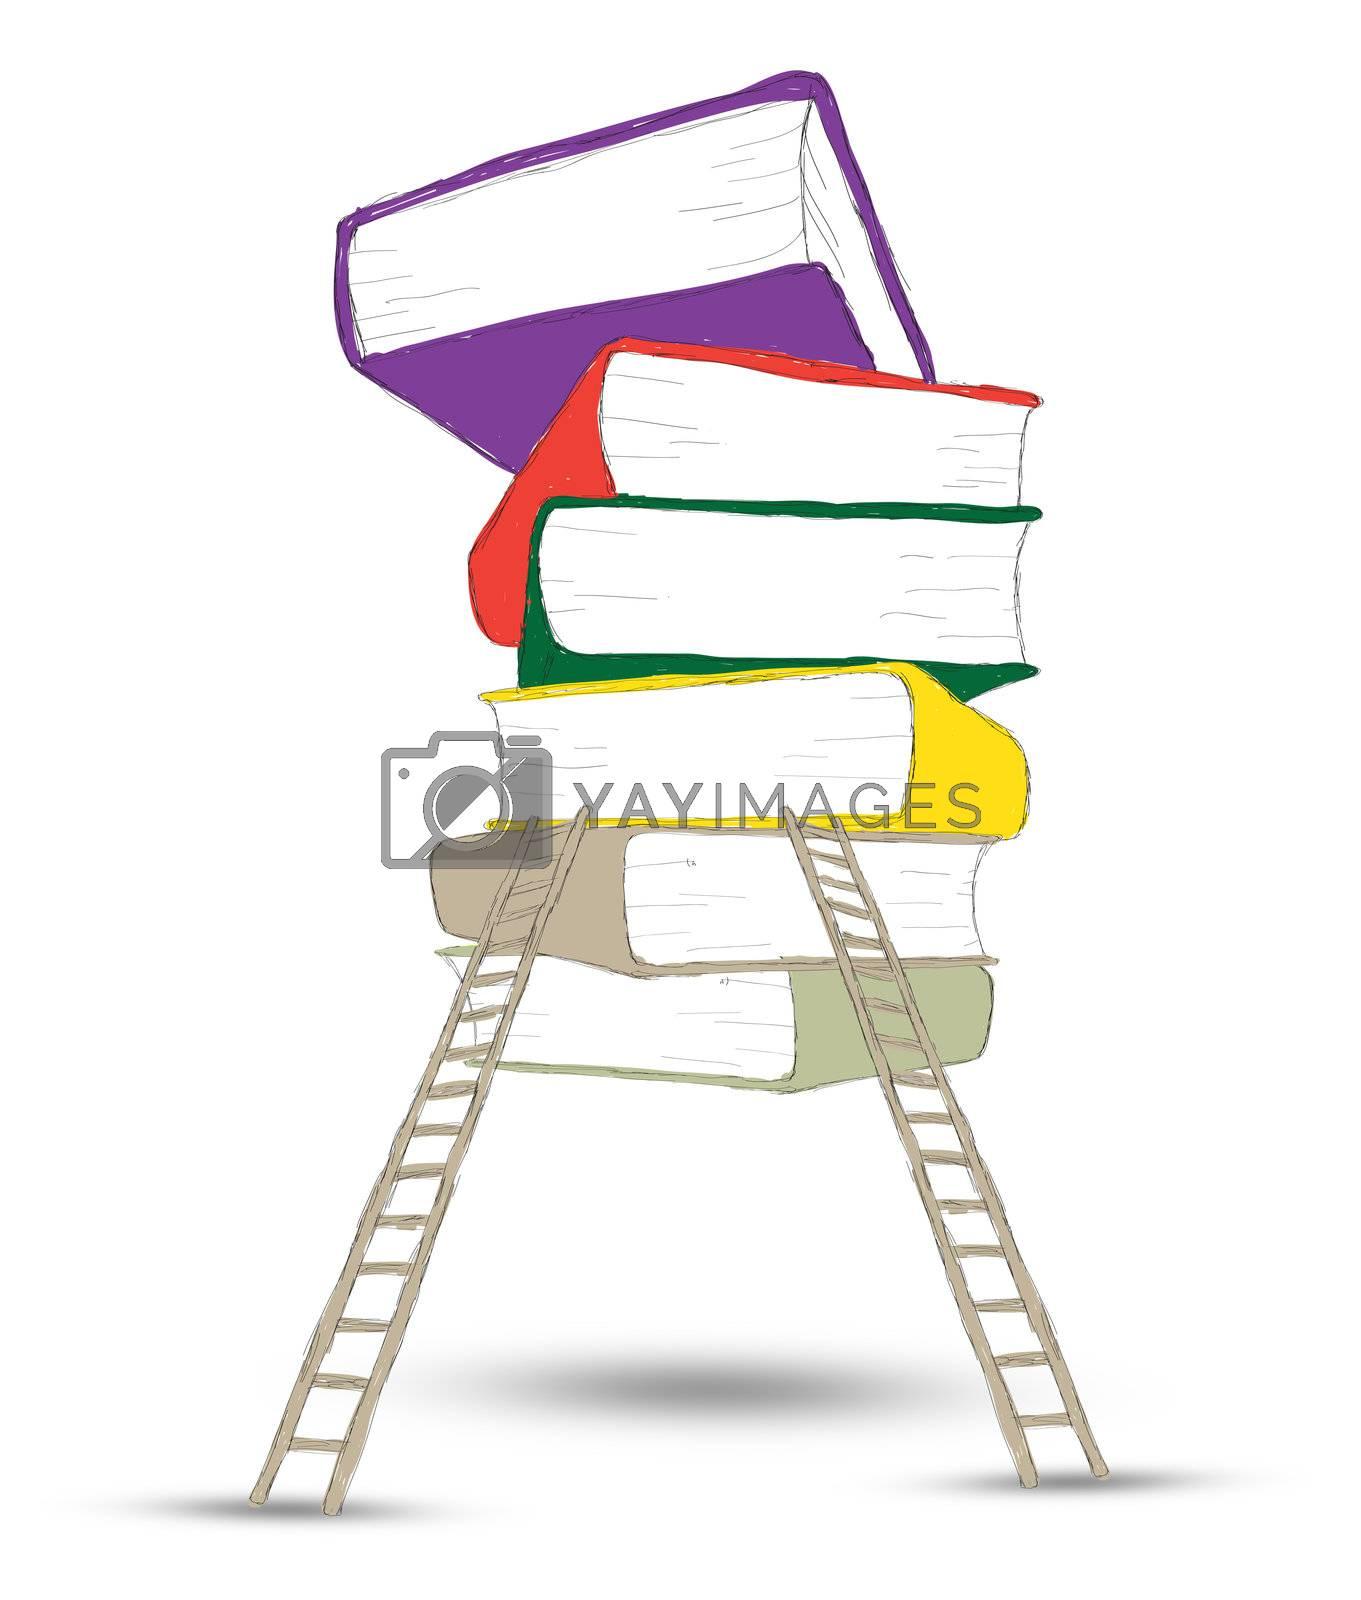 Wooden ladder standing near books pile